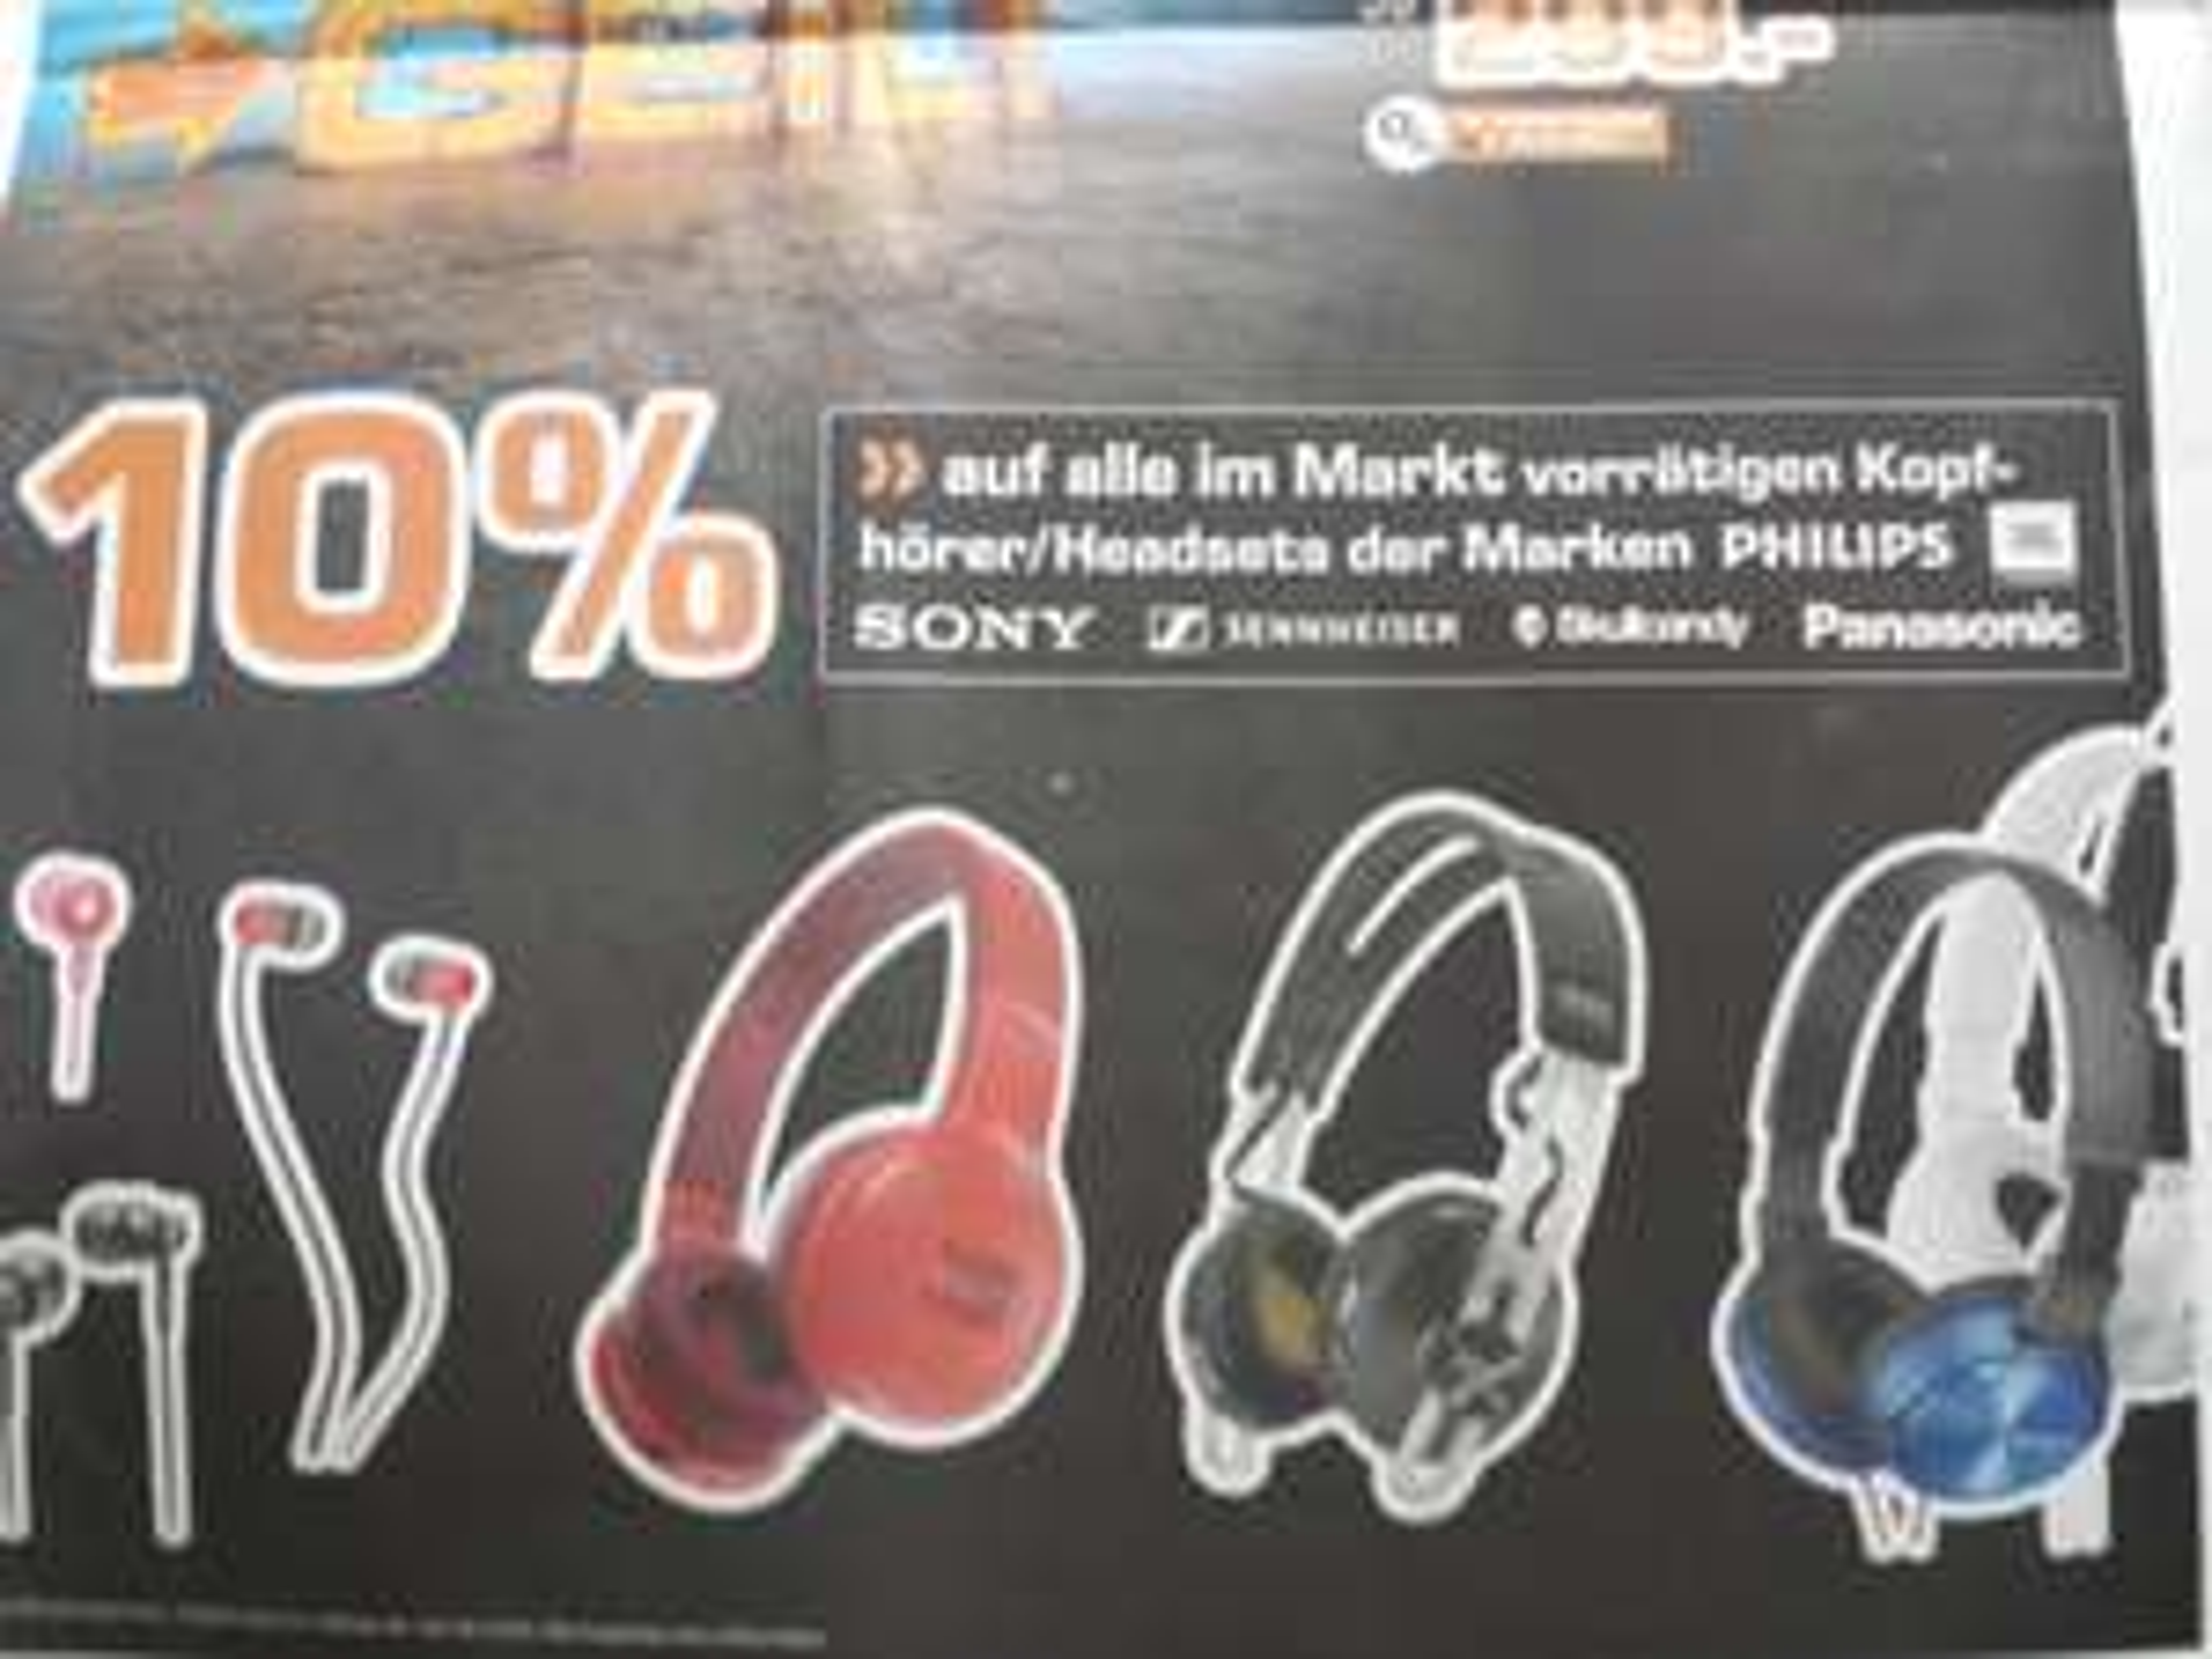 [LOKAL Saturn Karlsruhe] 10% Rabatt auf alle Kopfhörer/Headsets der Marken Philips, JBL, Sony, Sennheiser, Skullcandy & Panasonic